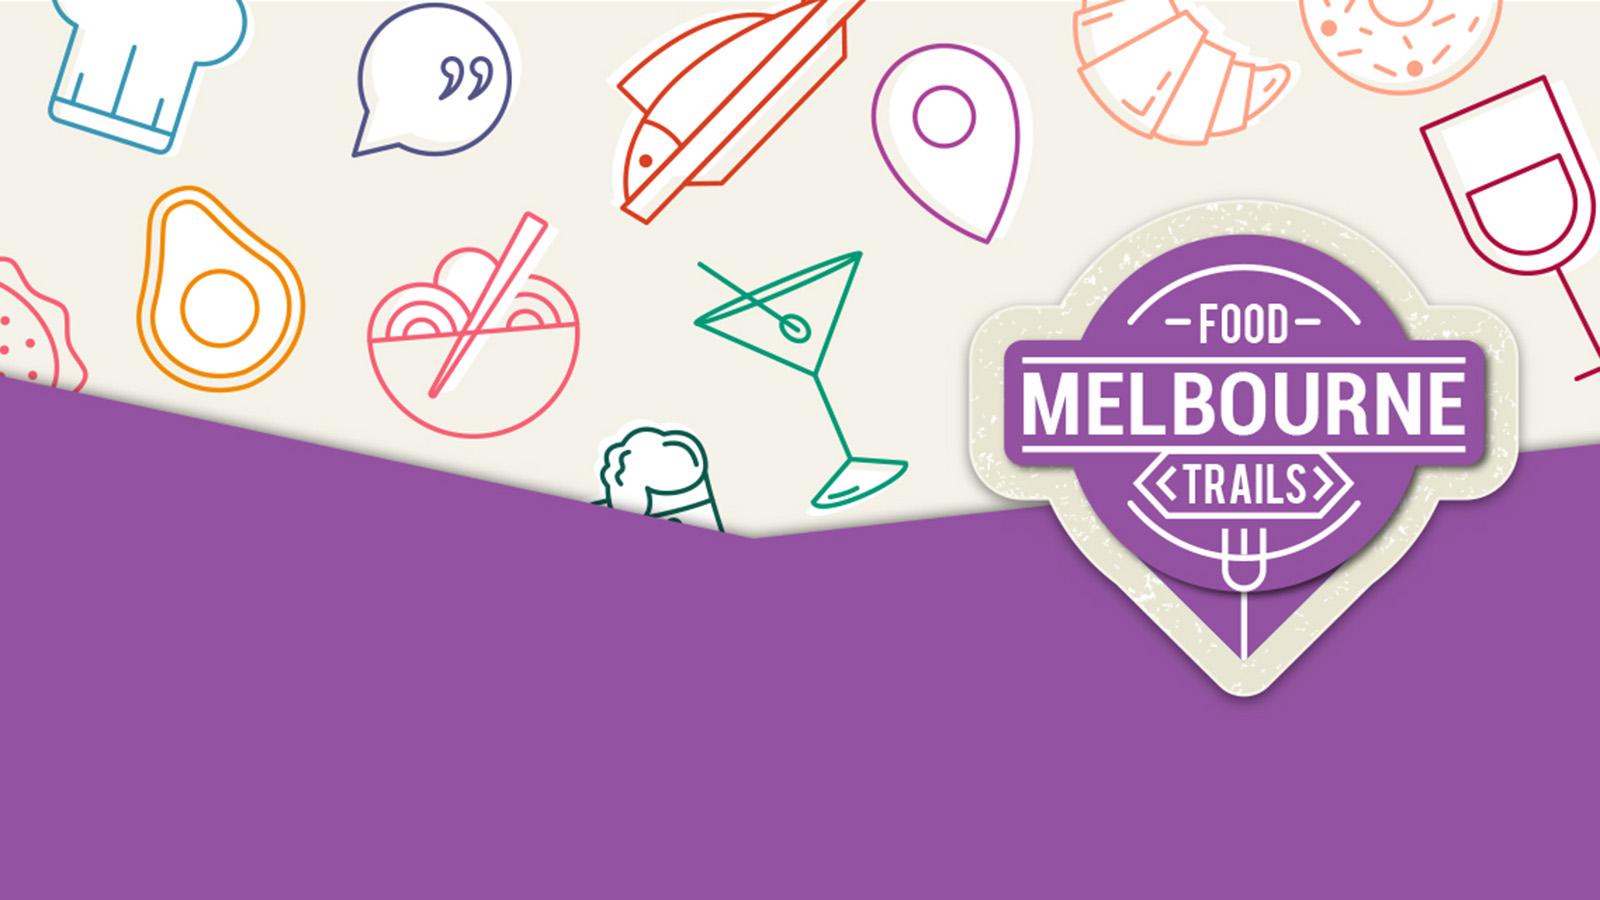 Melbourne Food Trails, Melbourne, Victoria, Australia